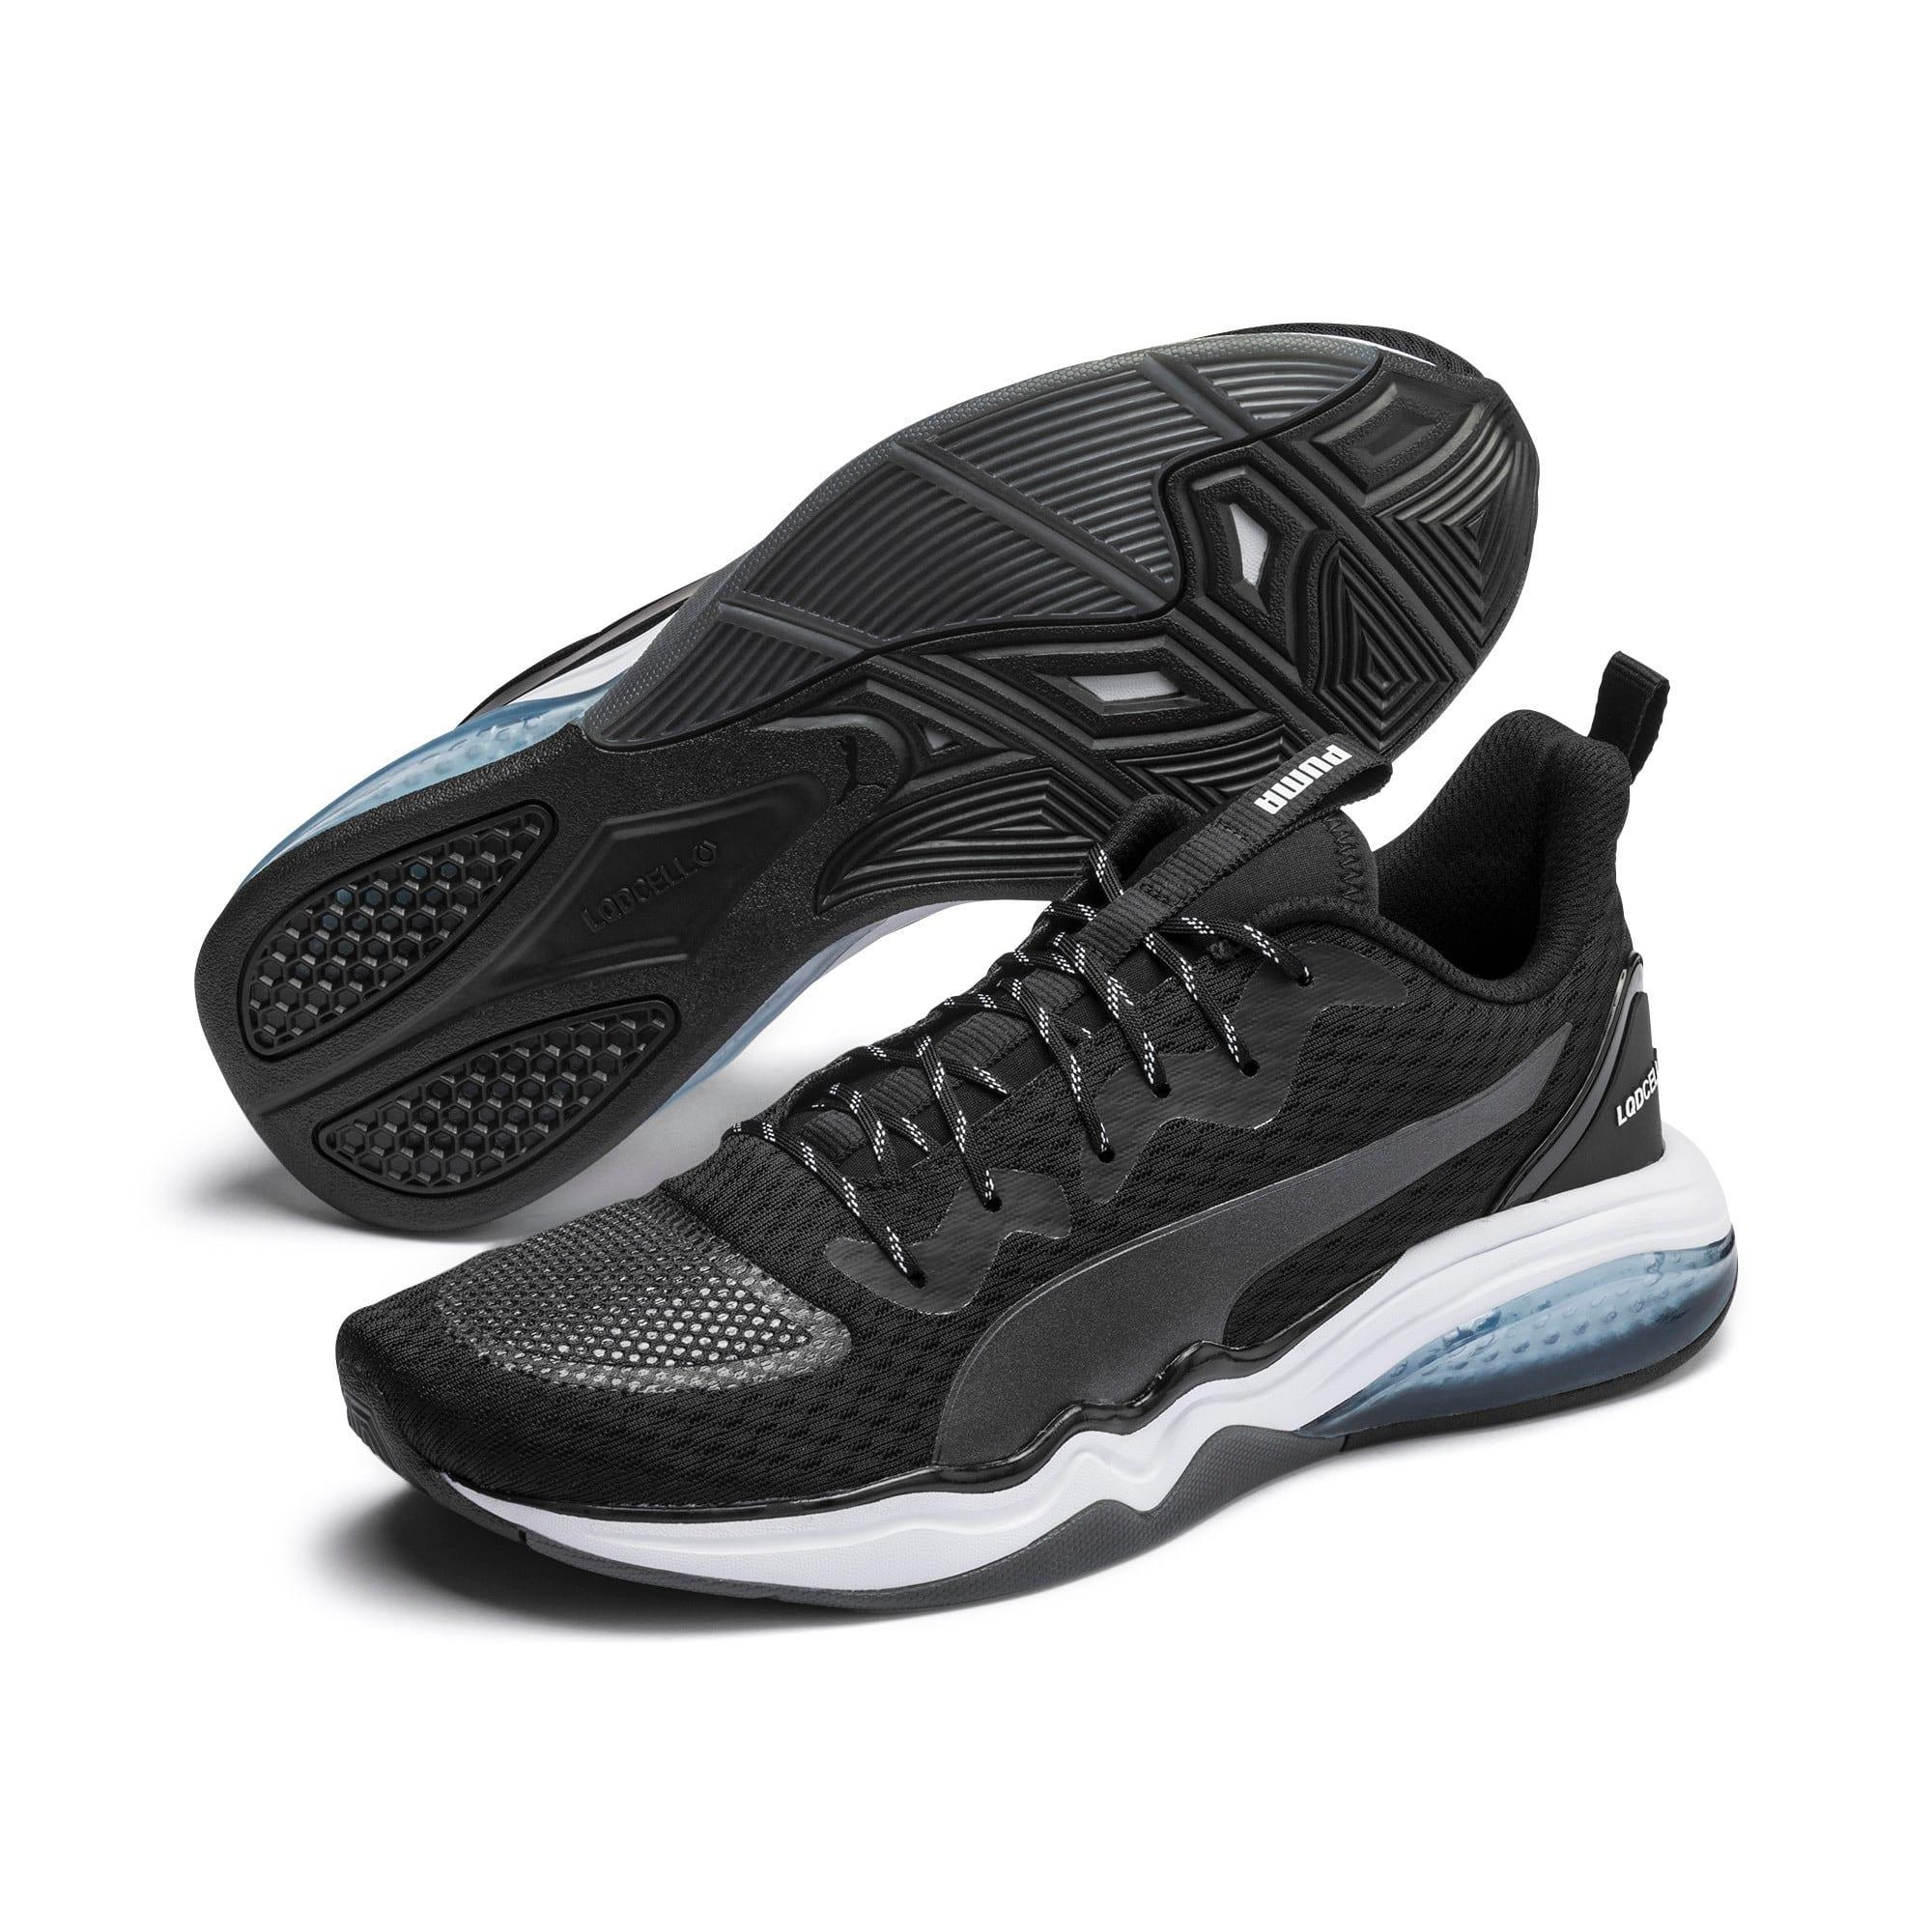 Thumbnail 4 of LQDCELL Tension Men's Training Shoes, Puma Black-Puma White, medium-IND